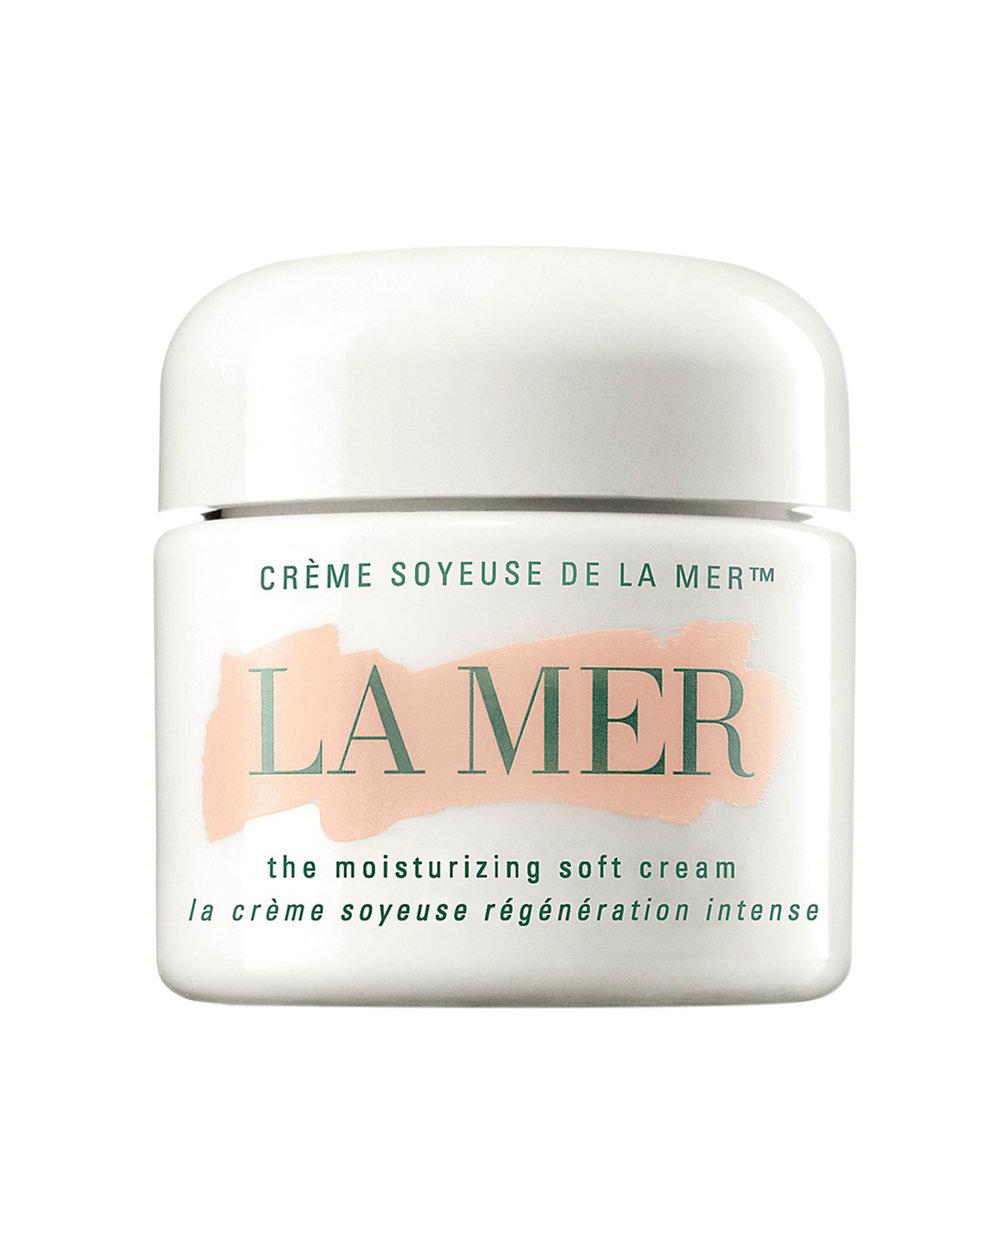 Under the Sea  The Moisturizing Soft Cream by La Mer $390  這款獲得了神奇面霜榮譽的保濕霜是讓La Mer成為傳奇品牌的很大助力。它來自於大海深處的饋贈:稀有的、營養驚人豐富的海帶。這款革命性的保濕霜質地更加輕盈,成為La Mer的明星產品。使用時用指尖蘸取少量塗於面部。